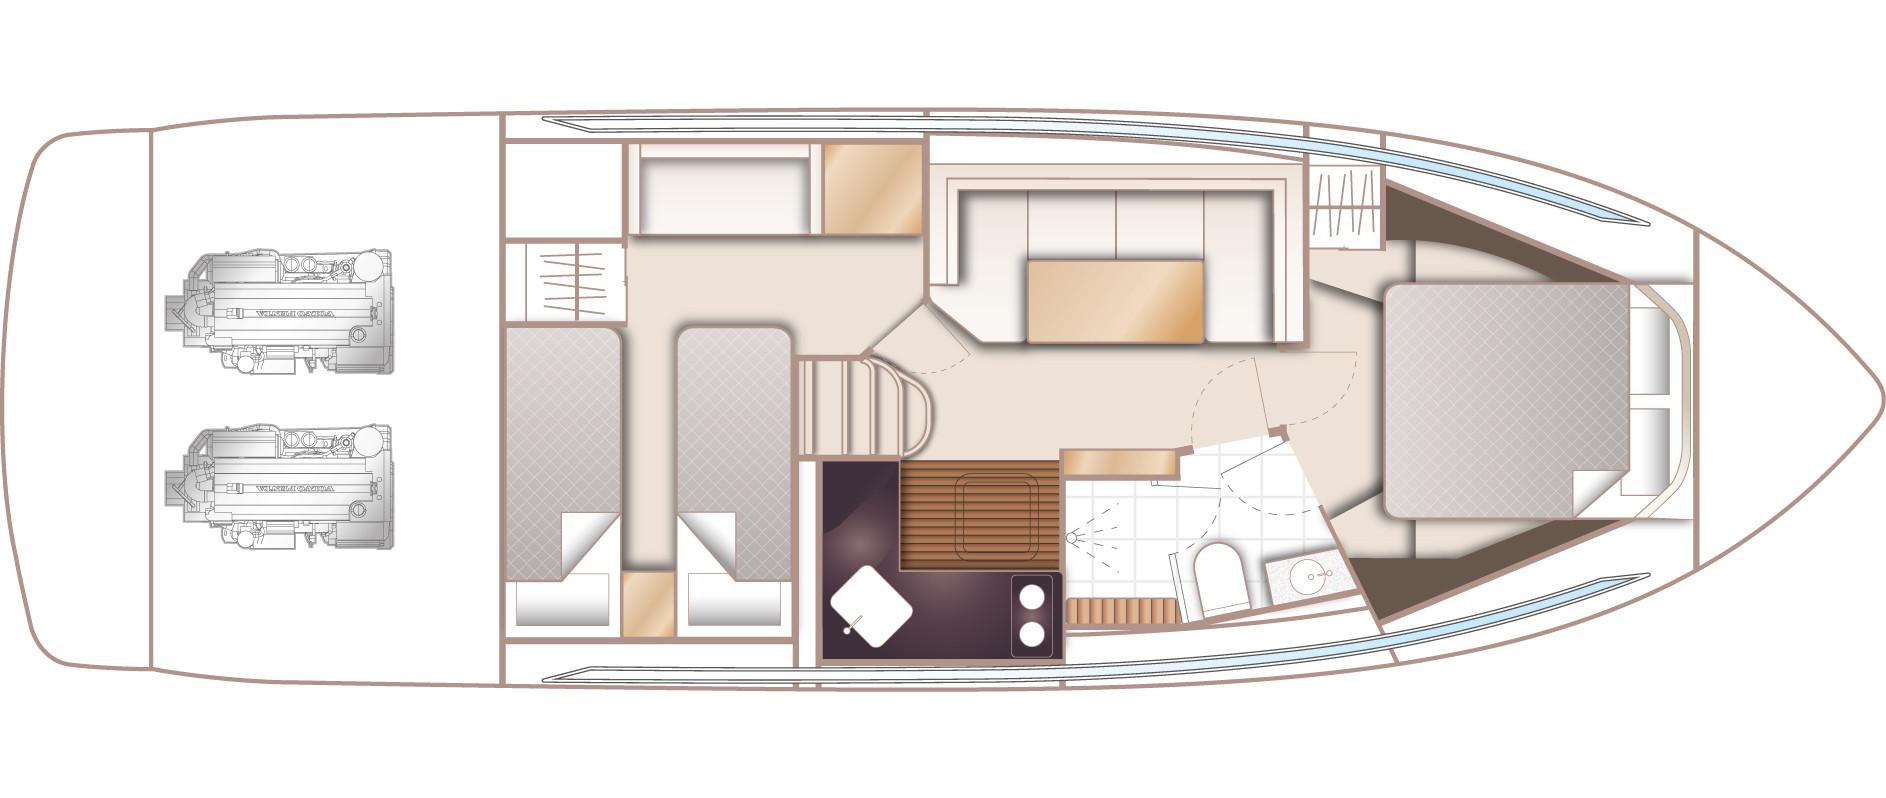 v40-layout-lower-deck.jpg